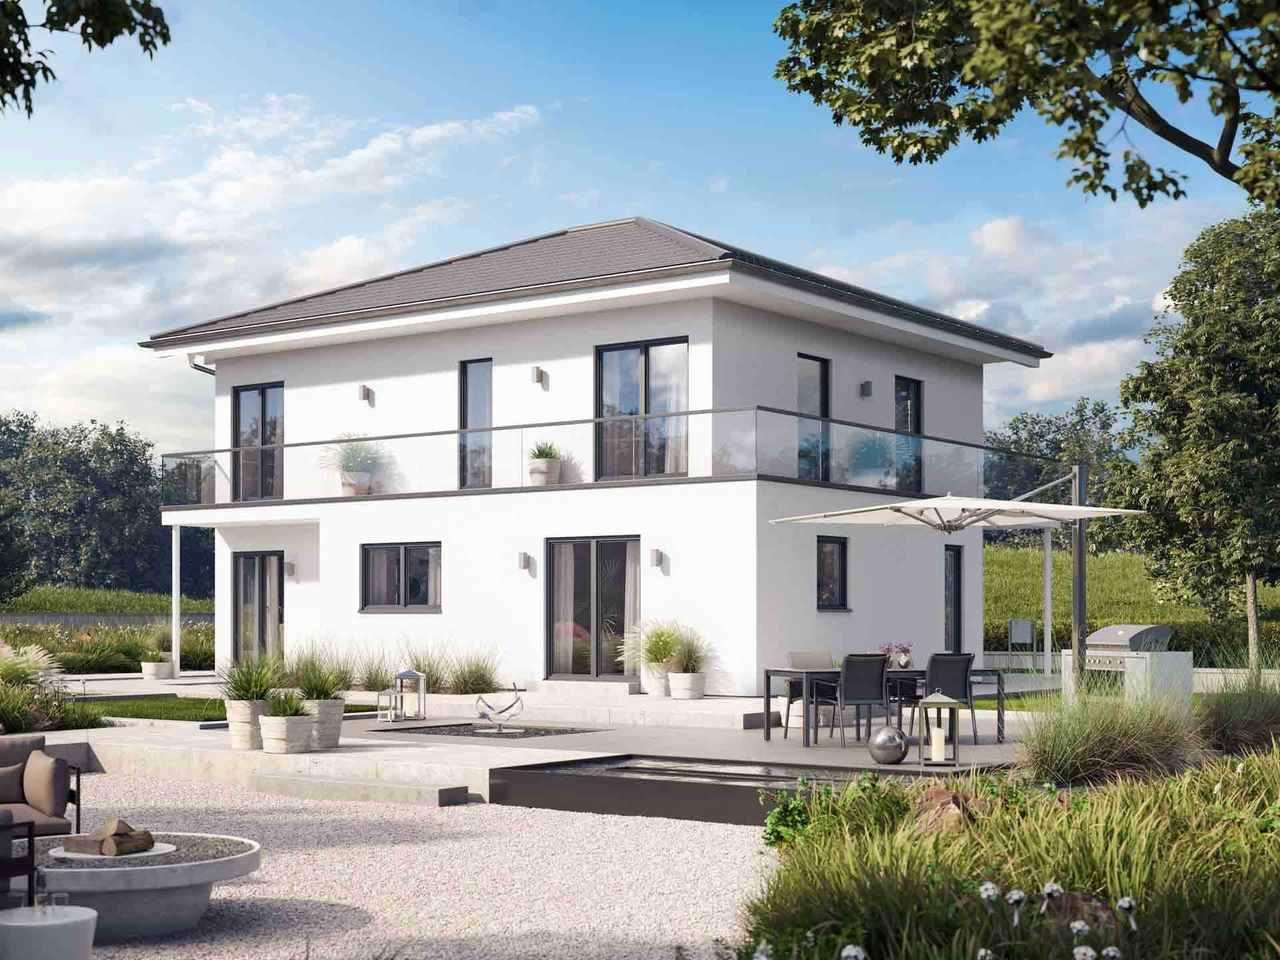 Einfamilienhaus Solitaire-E-165 E8 - Schwabenhaus